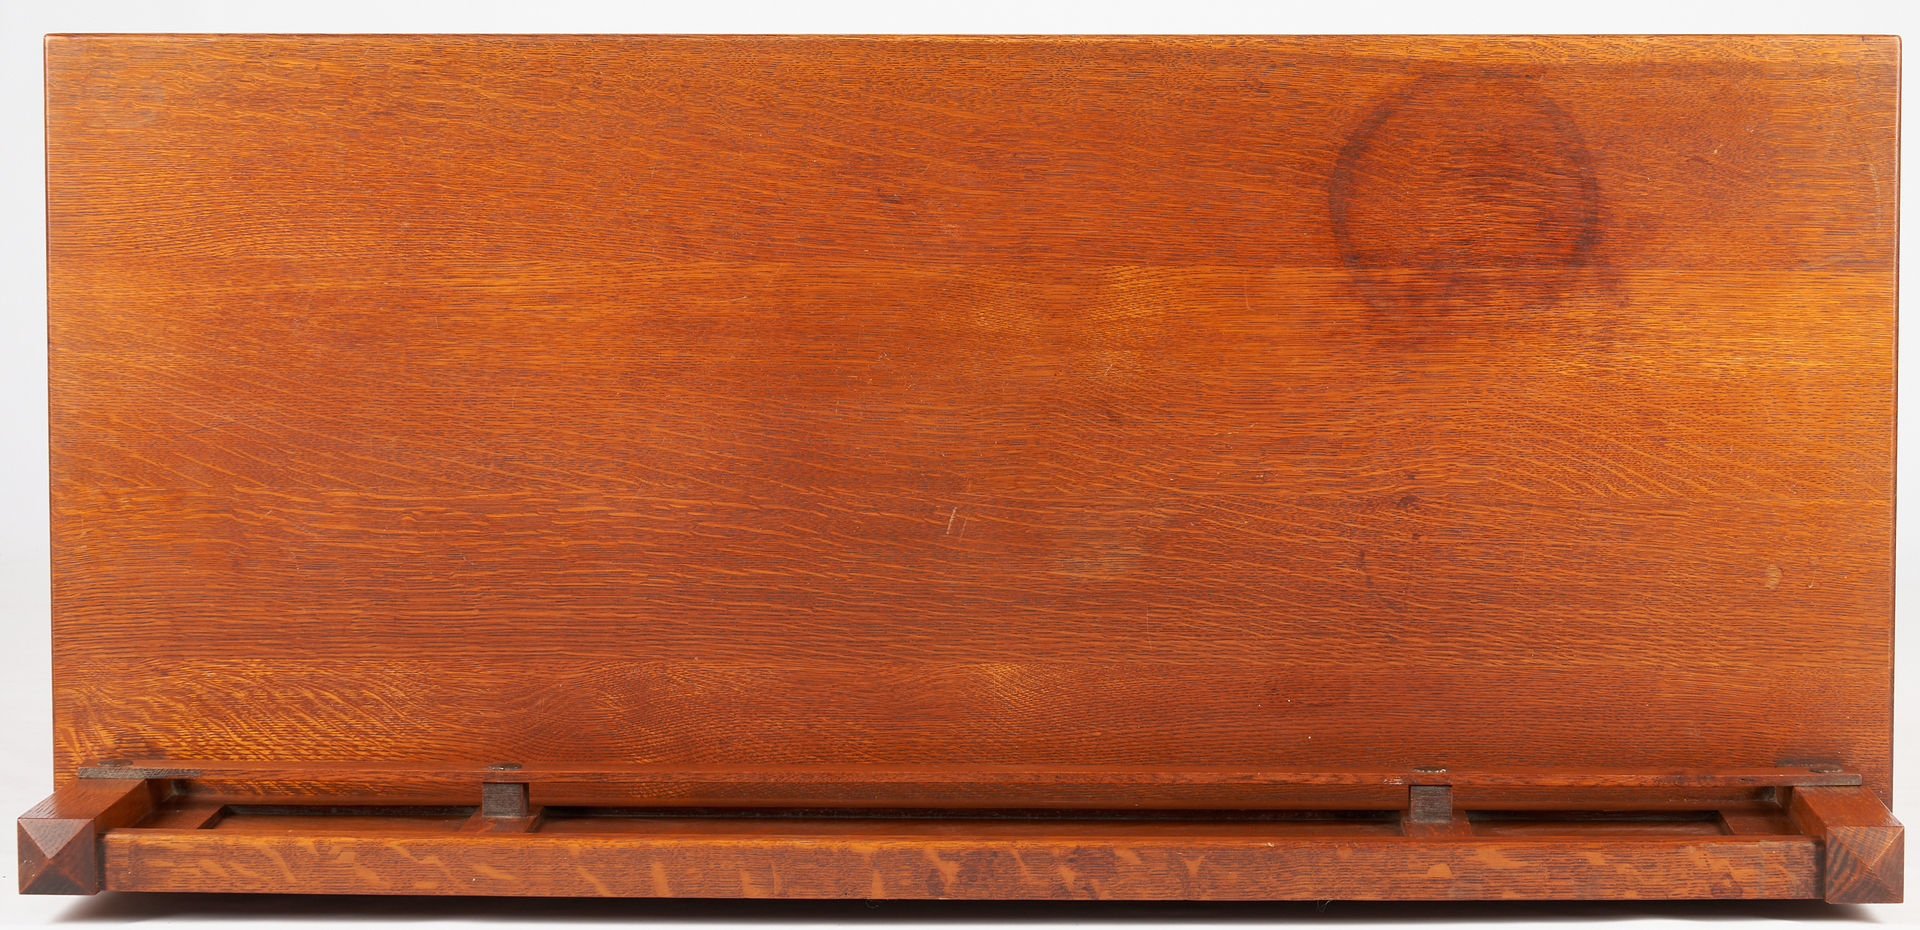 Lot 531: Stickley Brothers Arts & Crafts Oak Sideboard